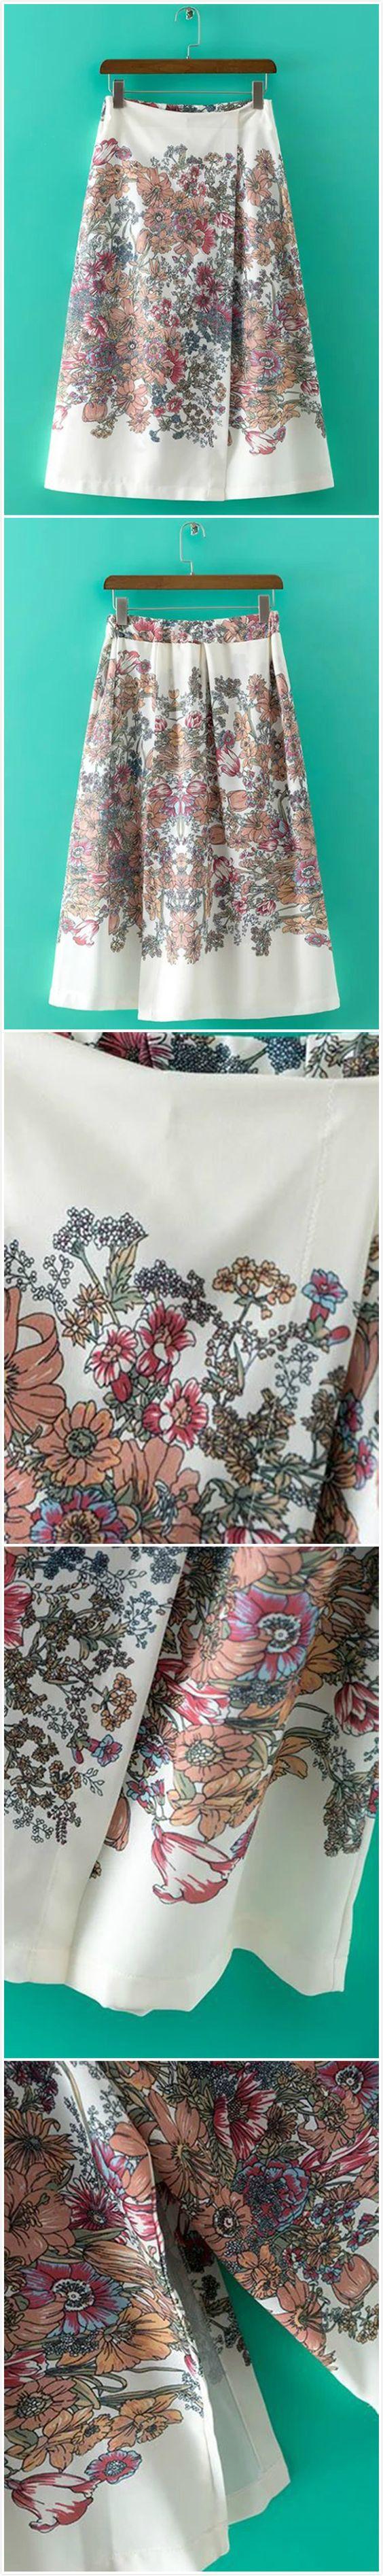 Women's Vintage Floral Print Elastic Waist Wide-legs Pants